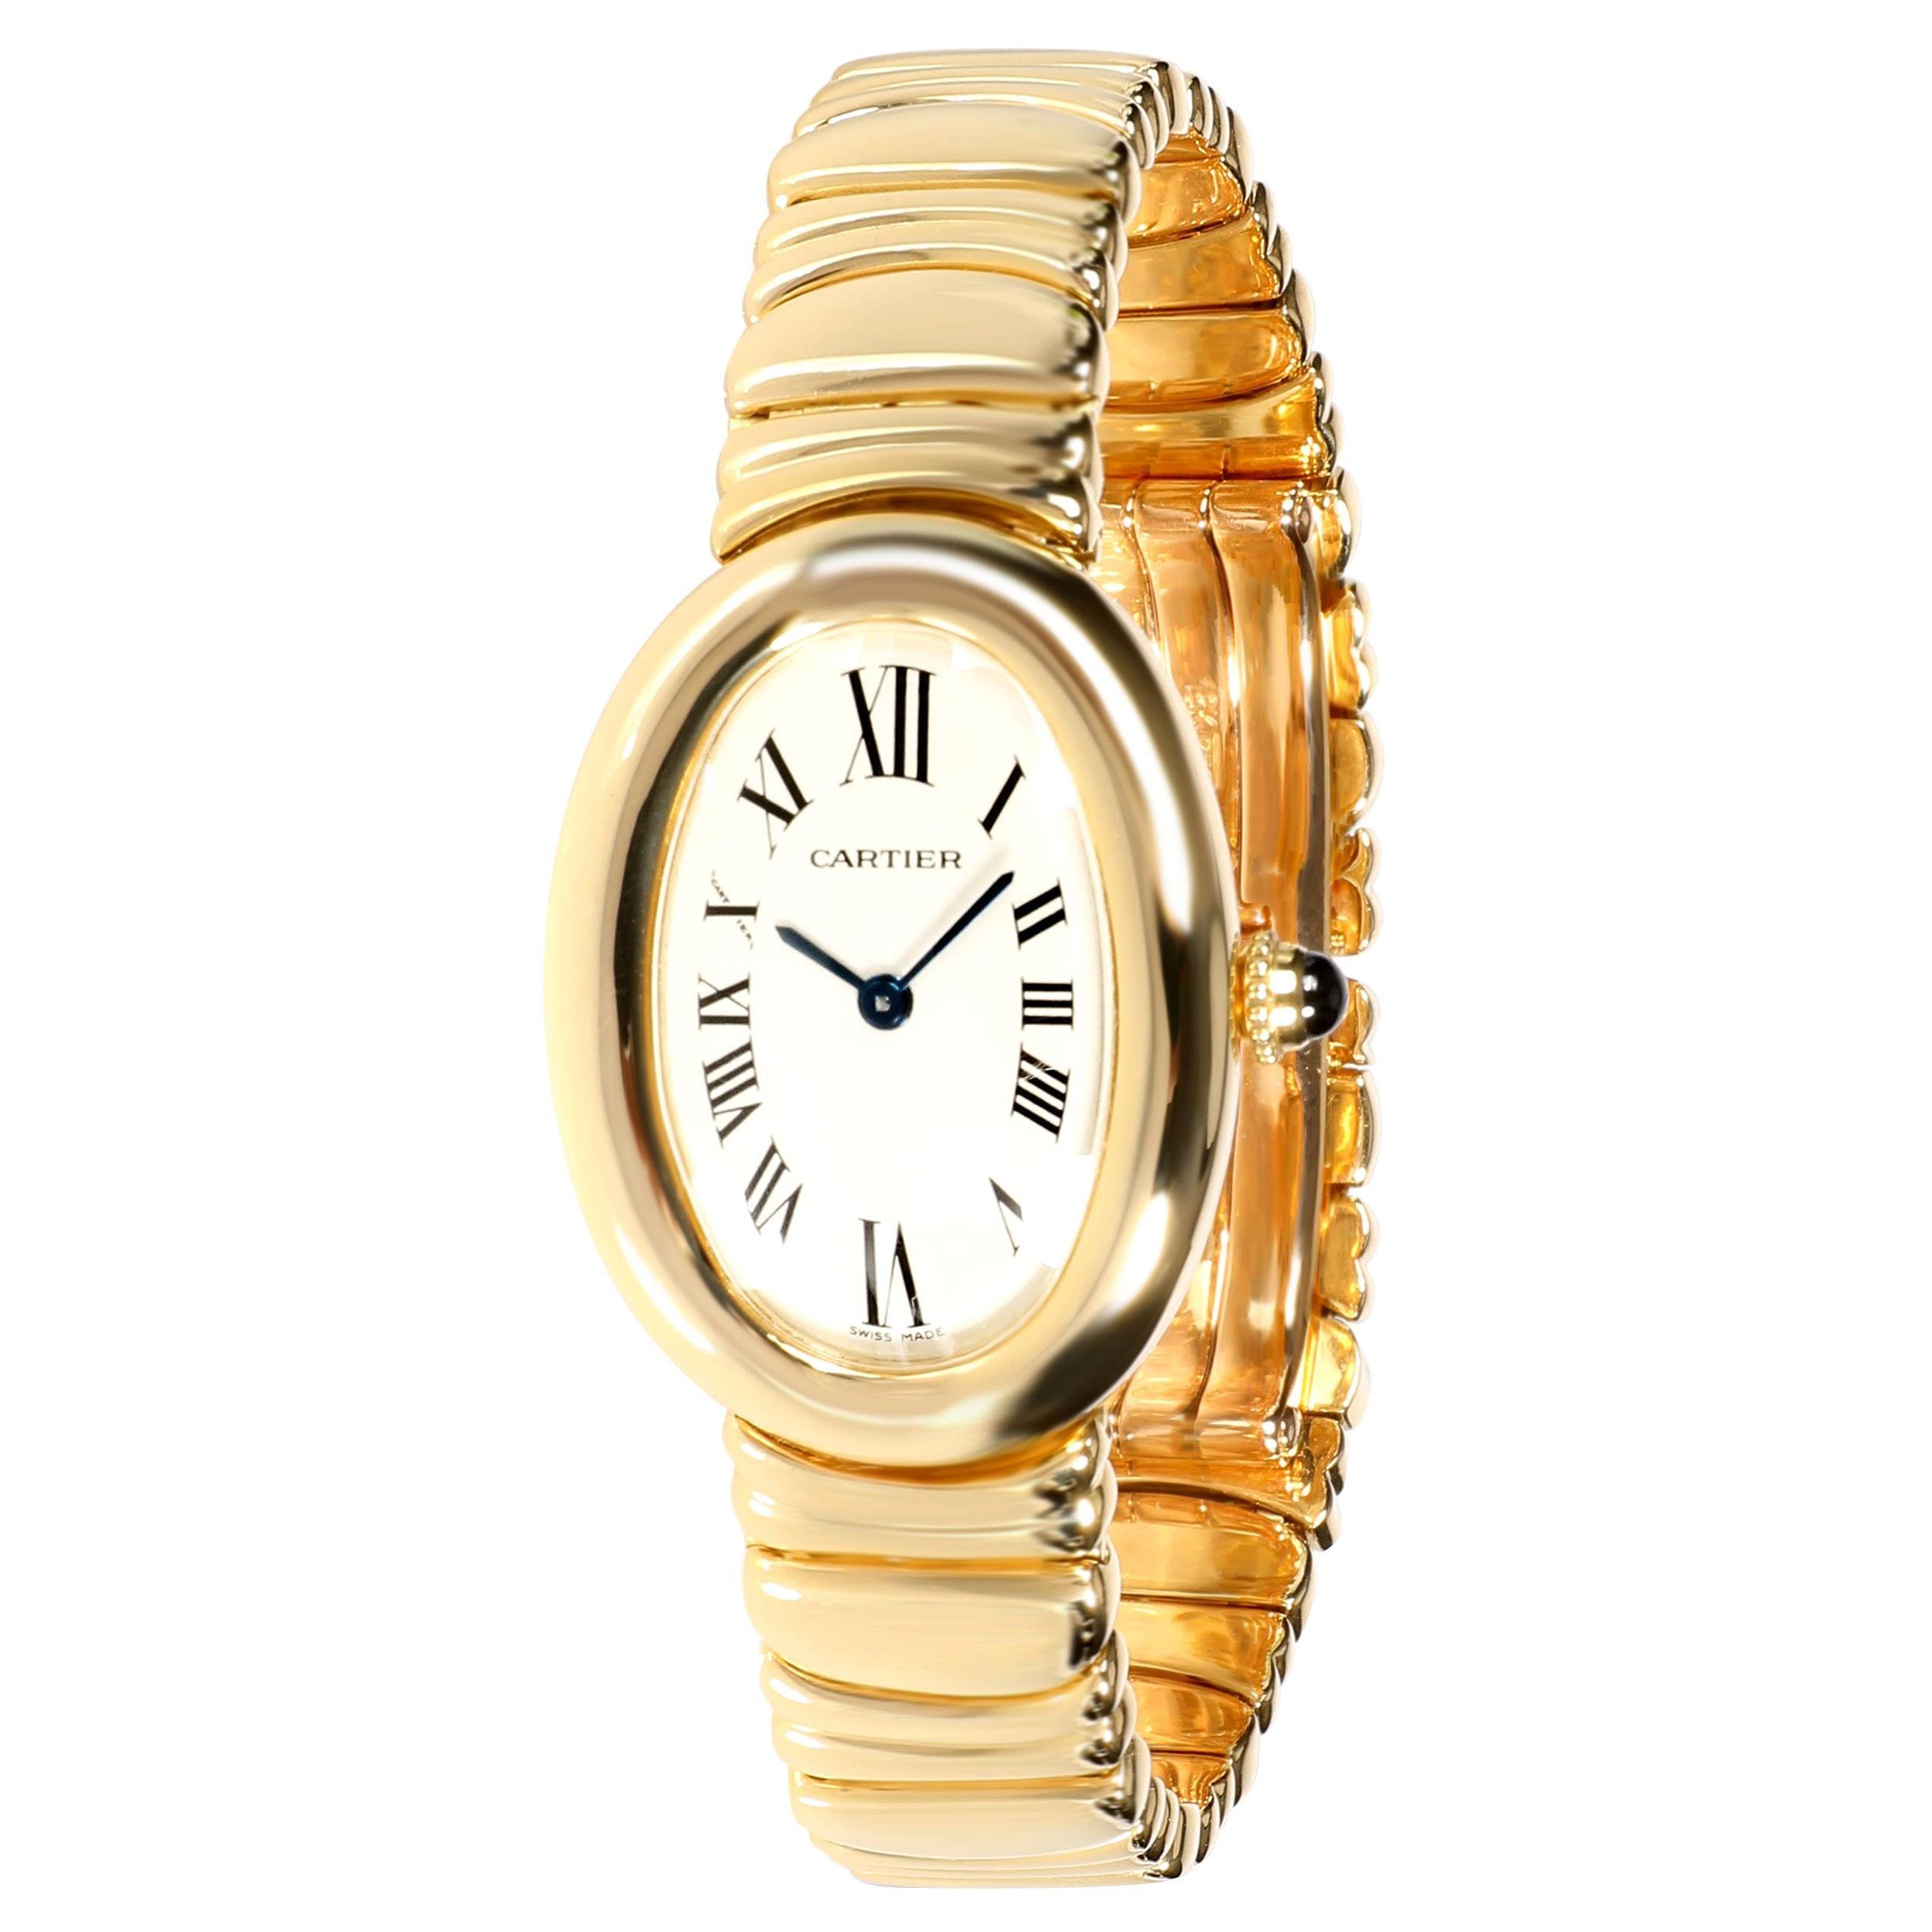 Cartier Baignoire 1954 Women's Watch in 18 Karat Yellow Gold